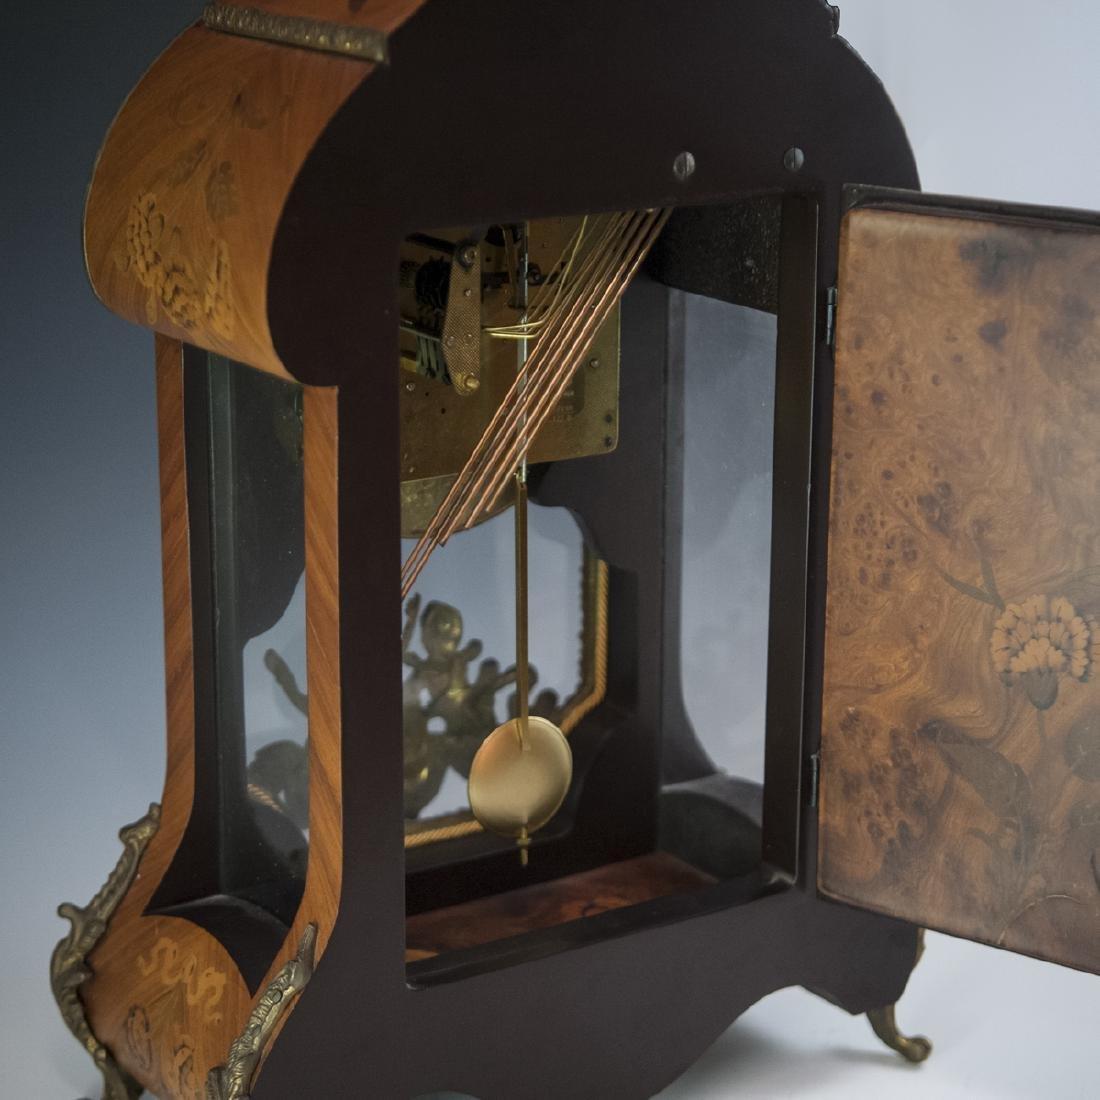 Franz Hermle and Sohn Marquetry & Bronze Mantel Clock - 5